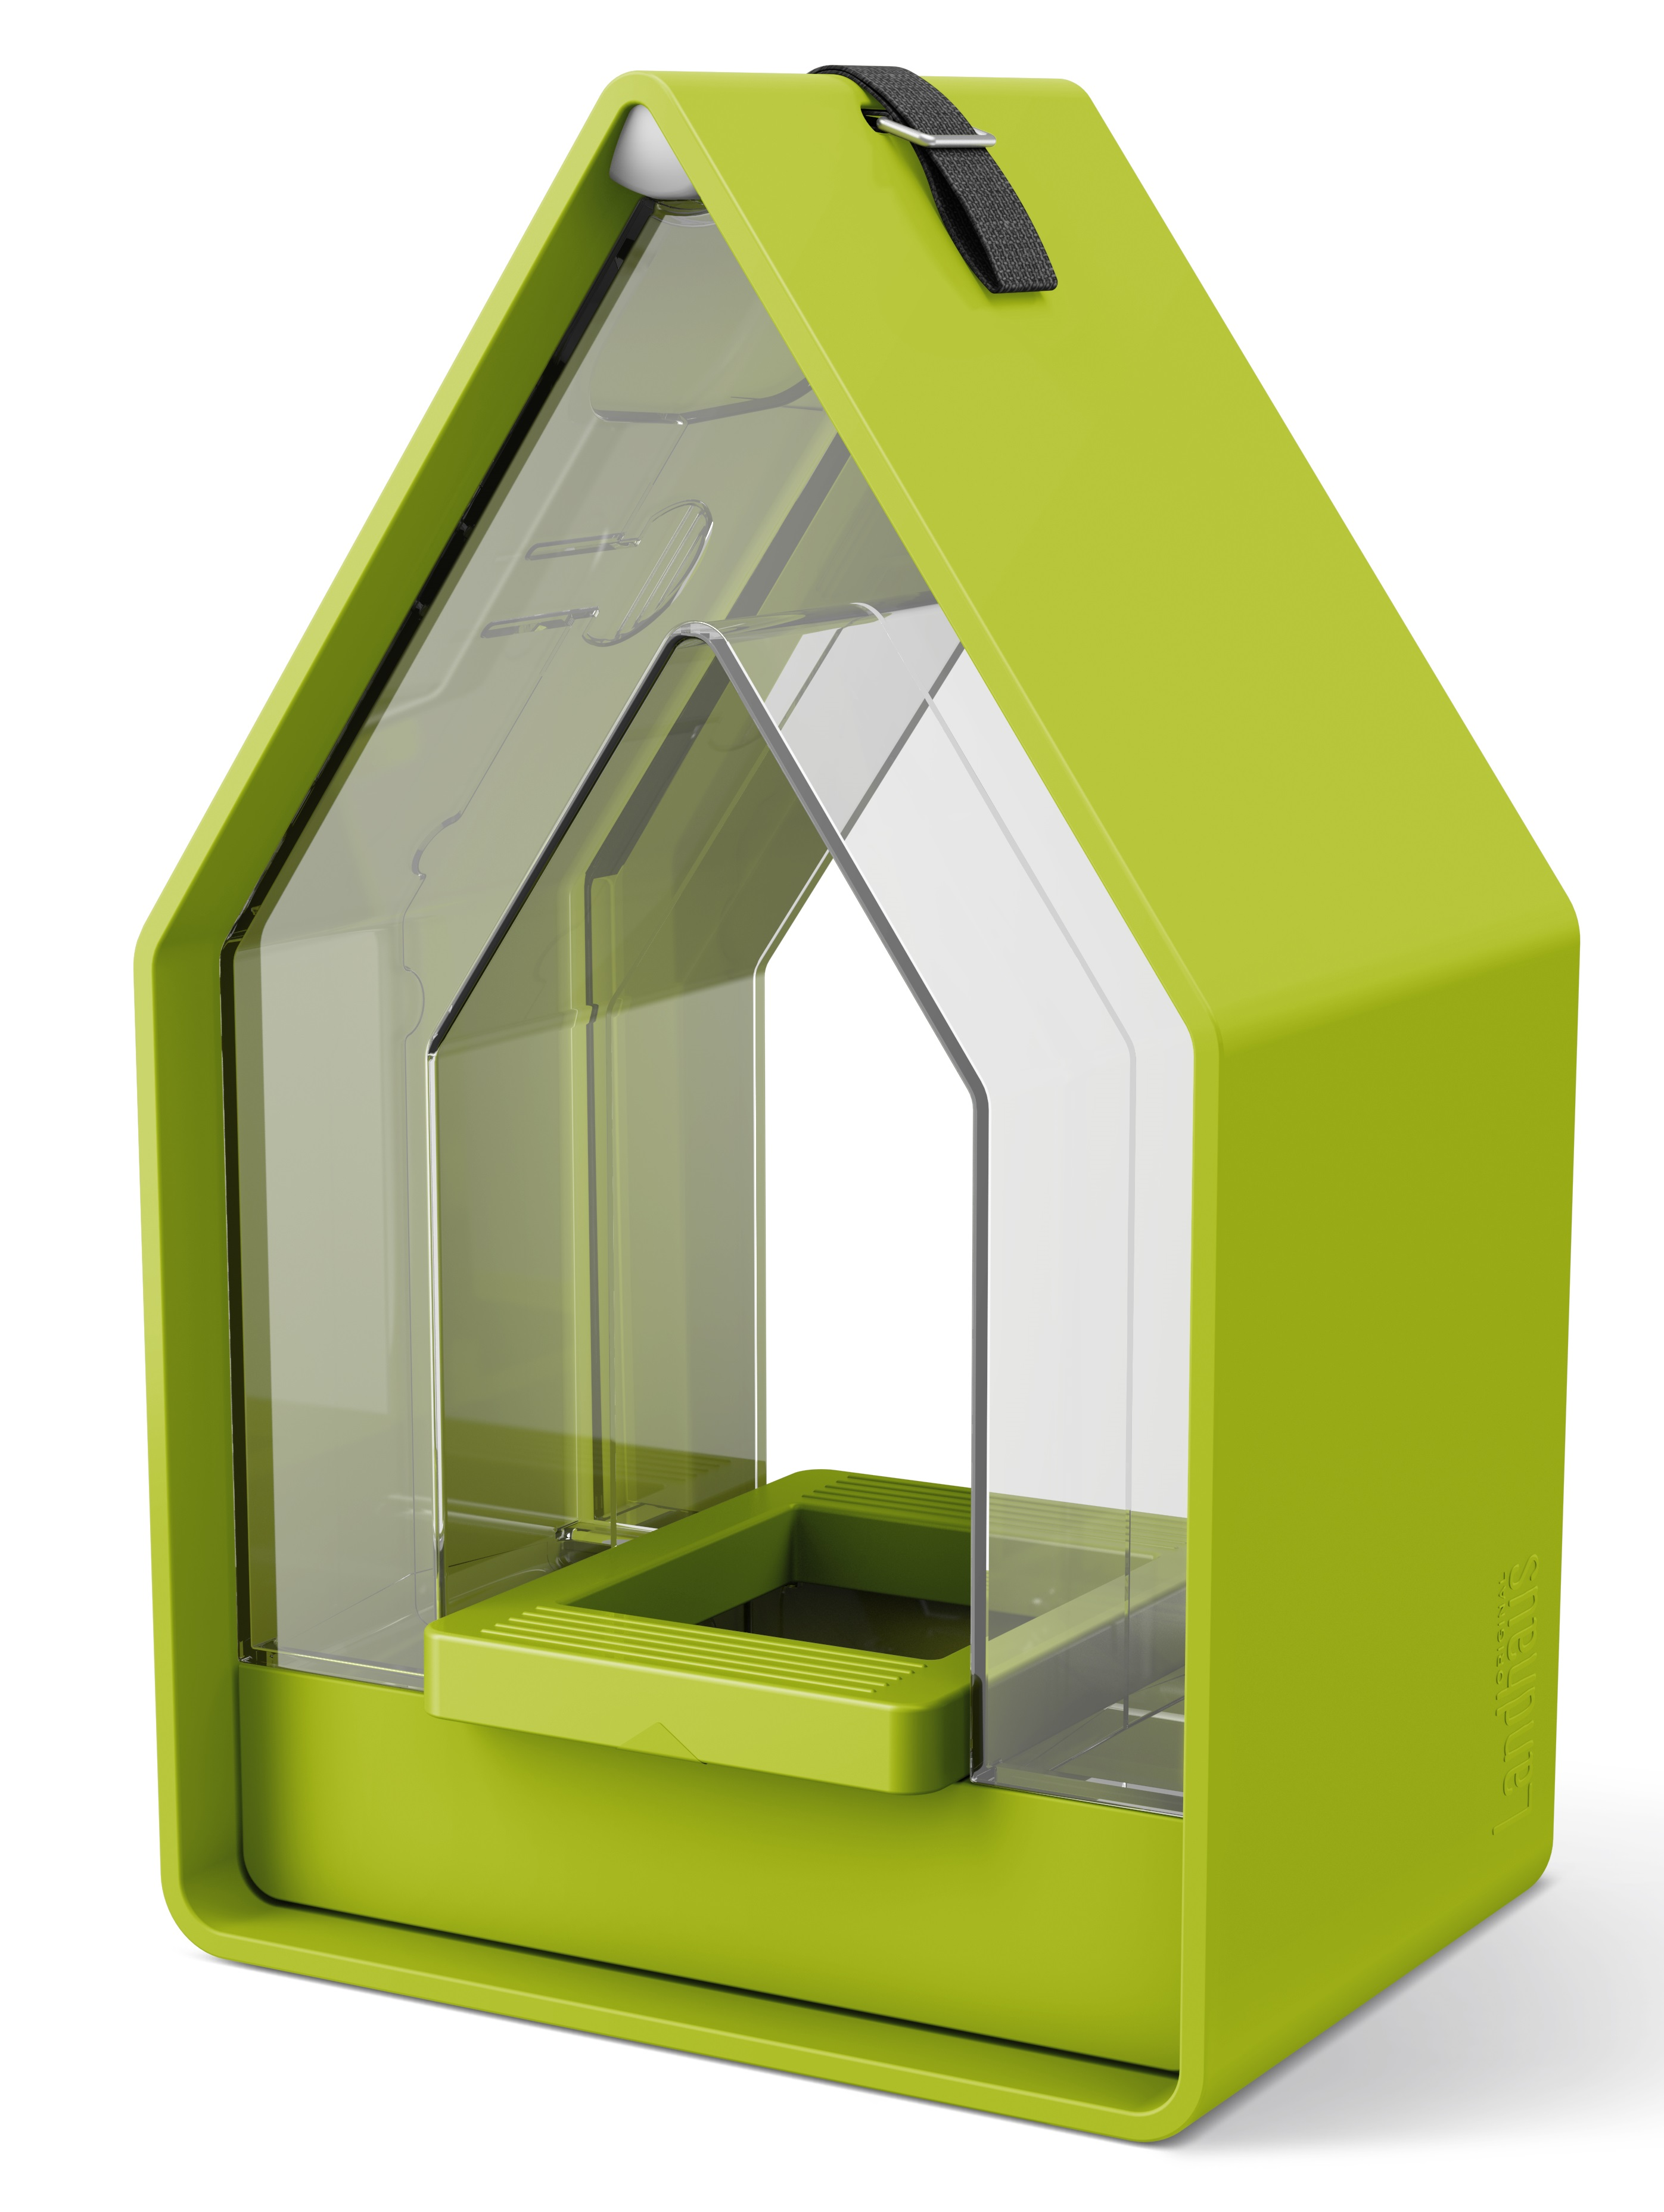 EMSA Krmítko se zásobníkem 15 x 24 cm zelené Landhaus Emsa